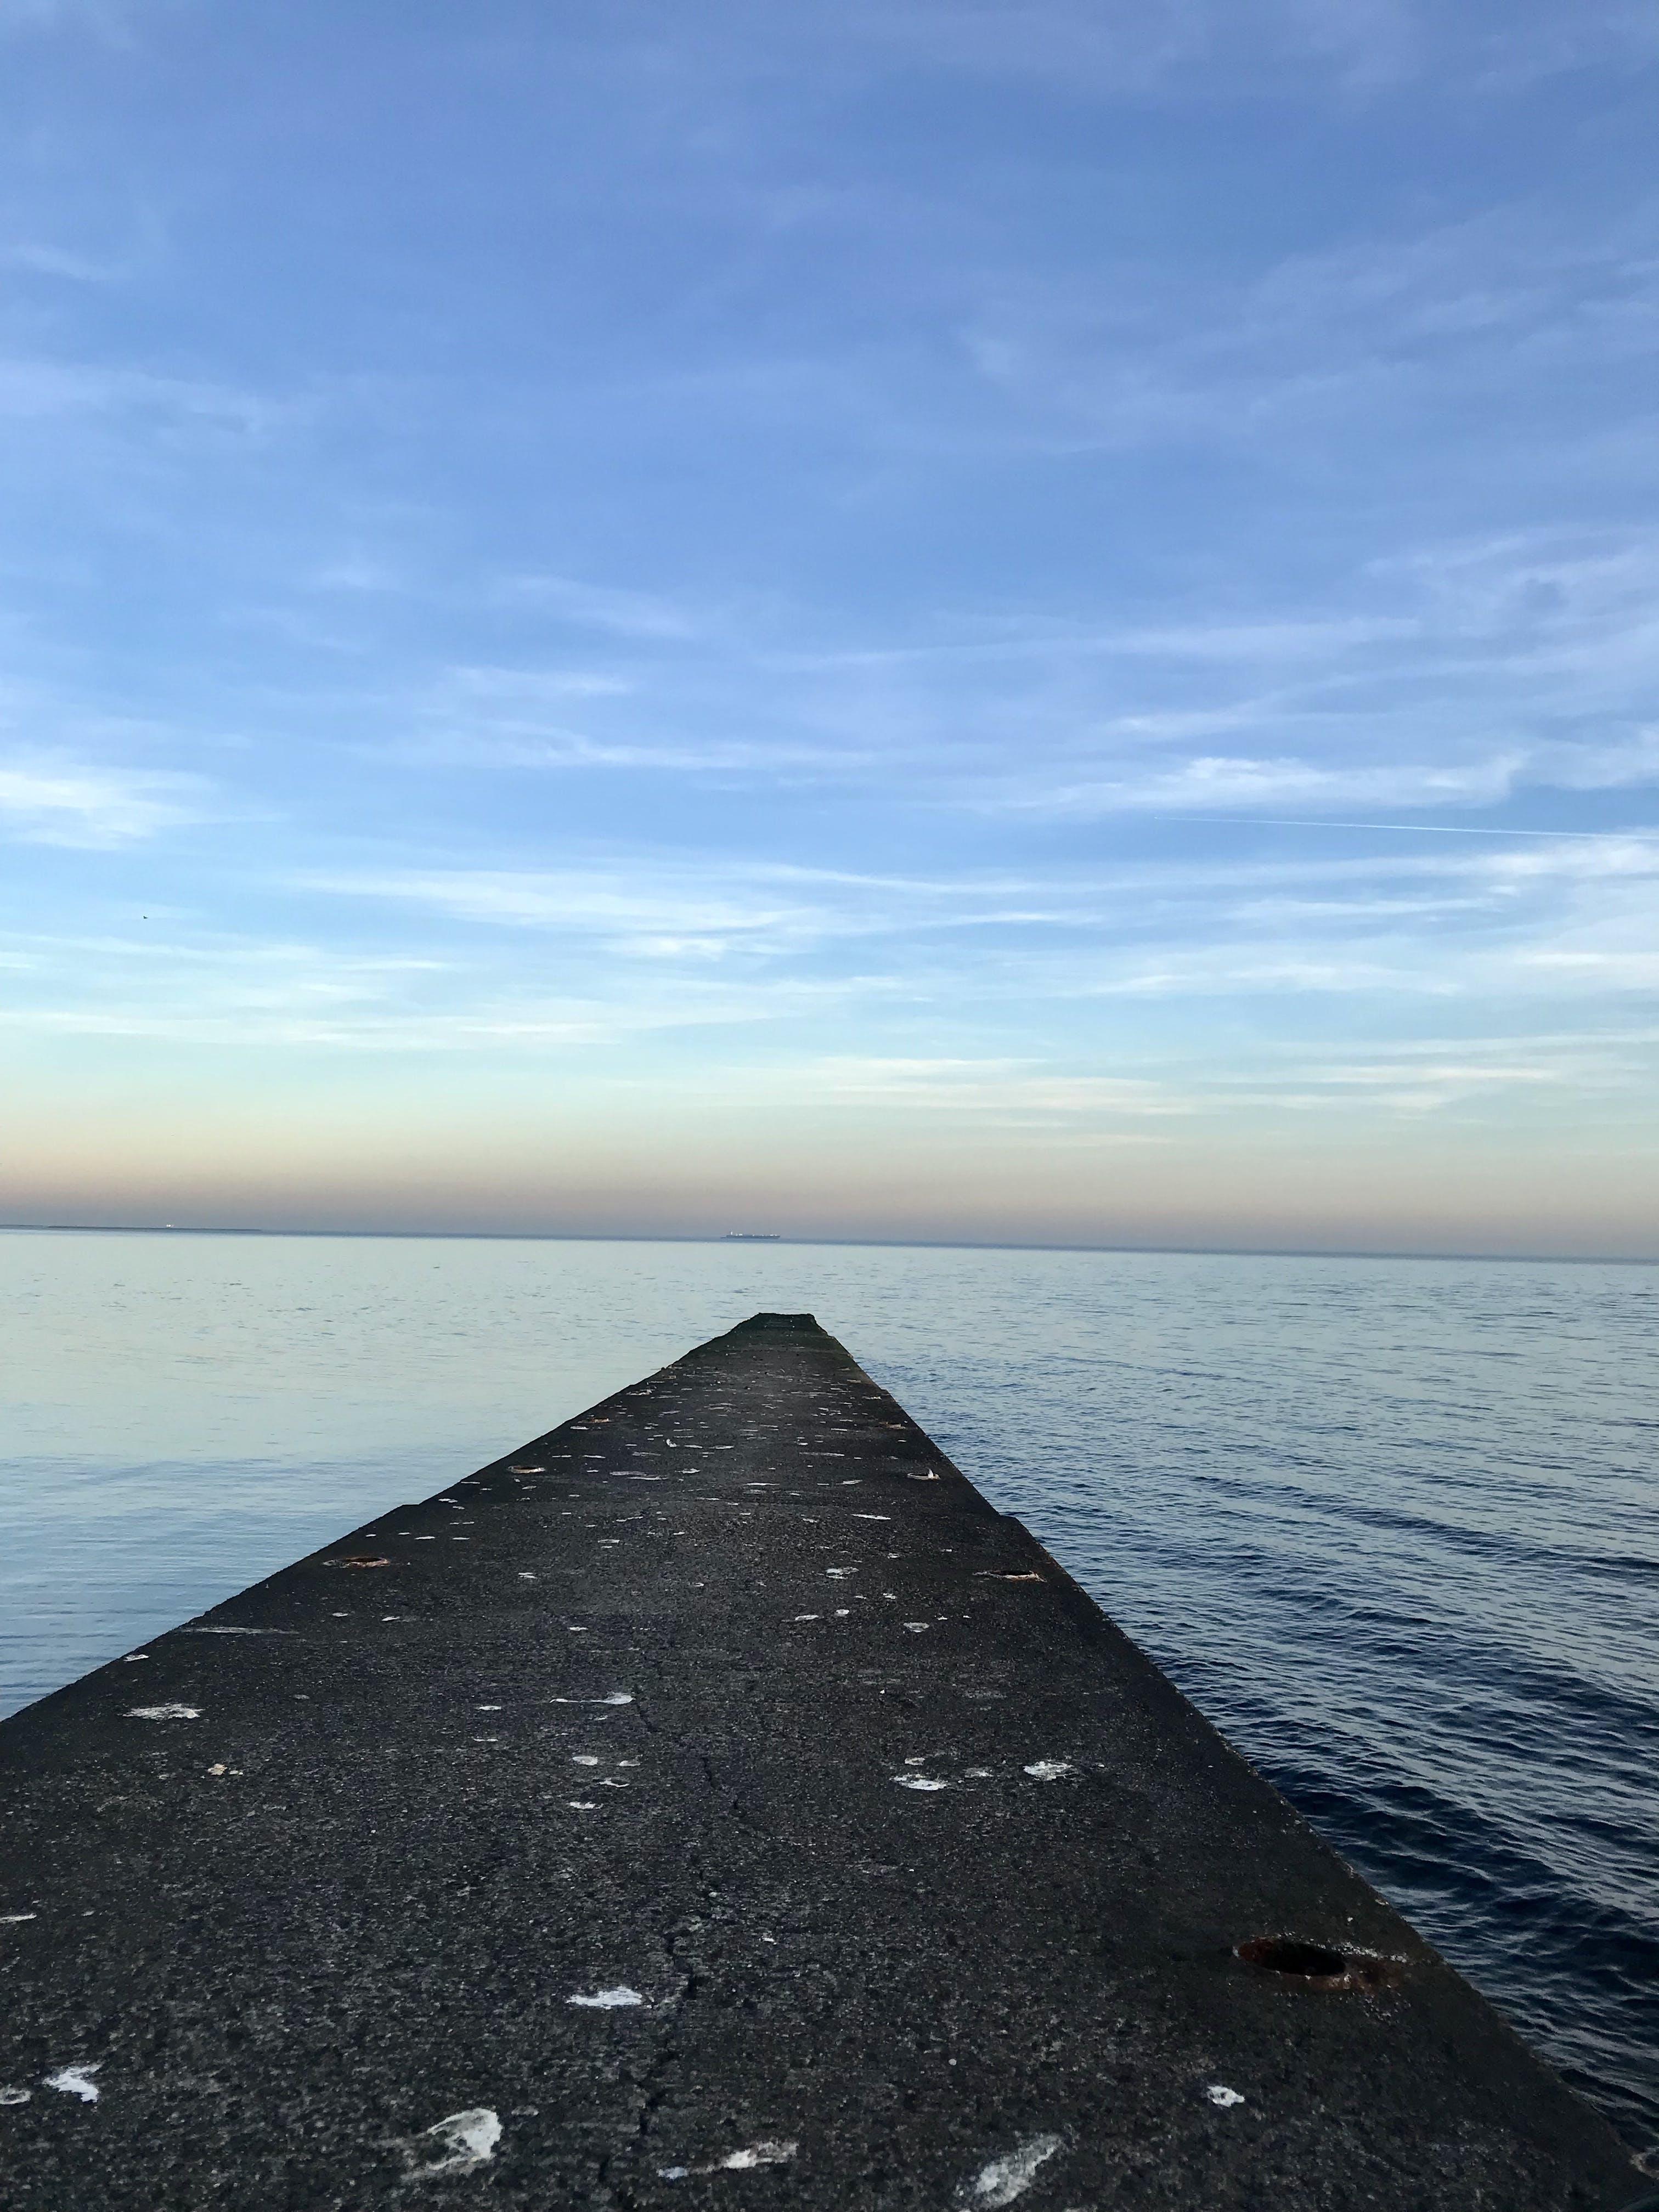 Free stock photo of dock, ocean, open water, sunset